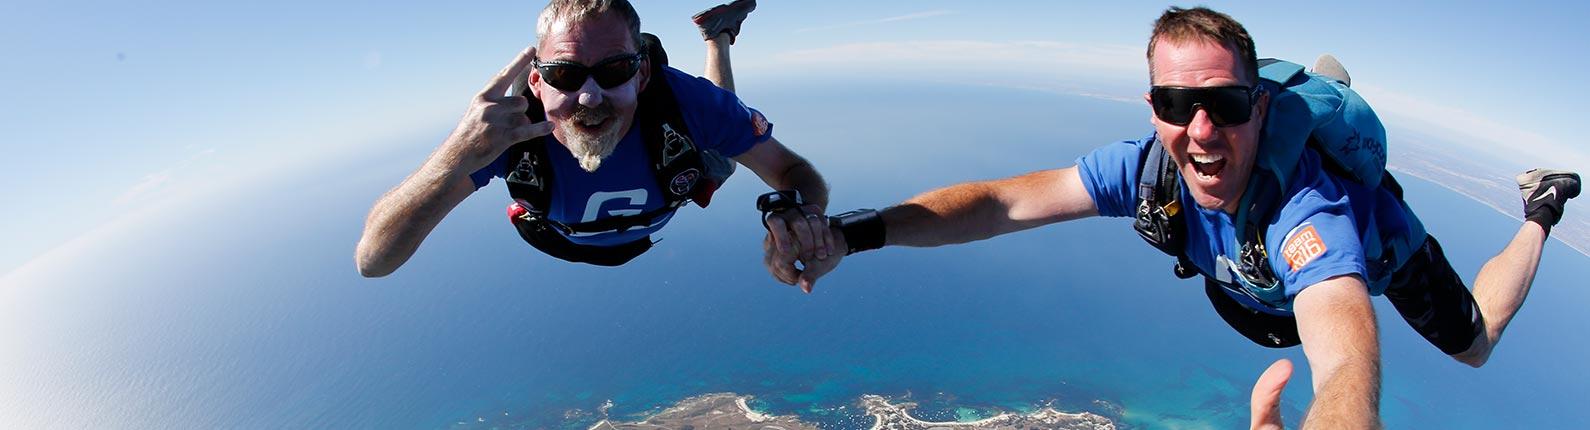 Skydiving Australia